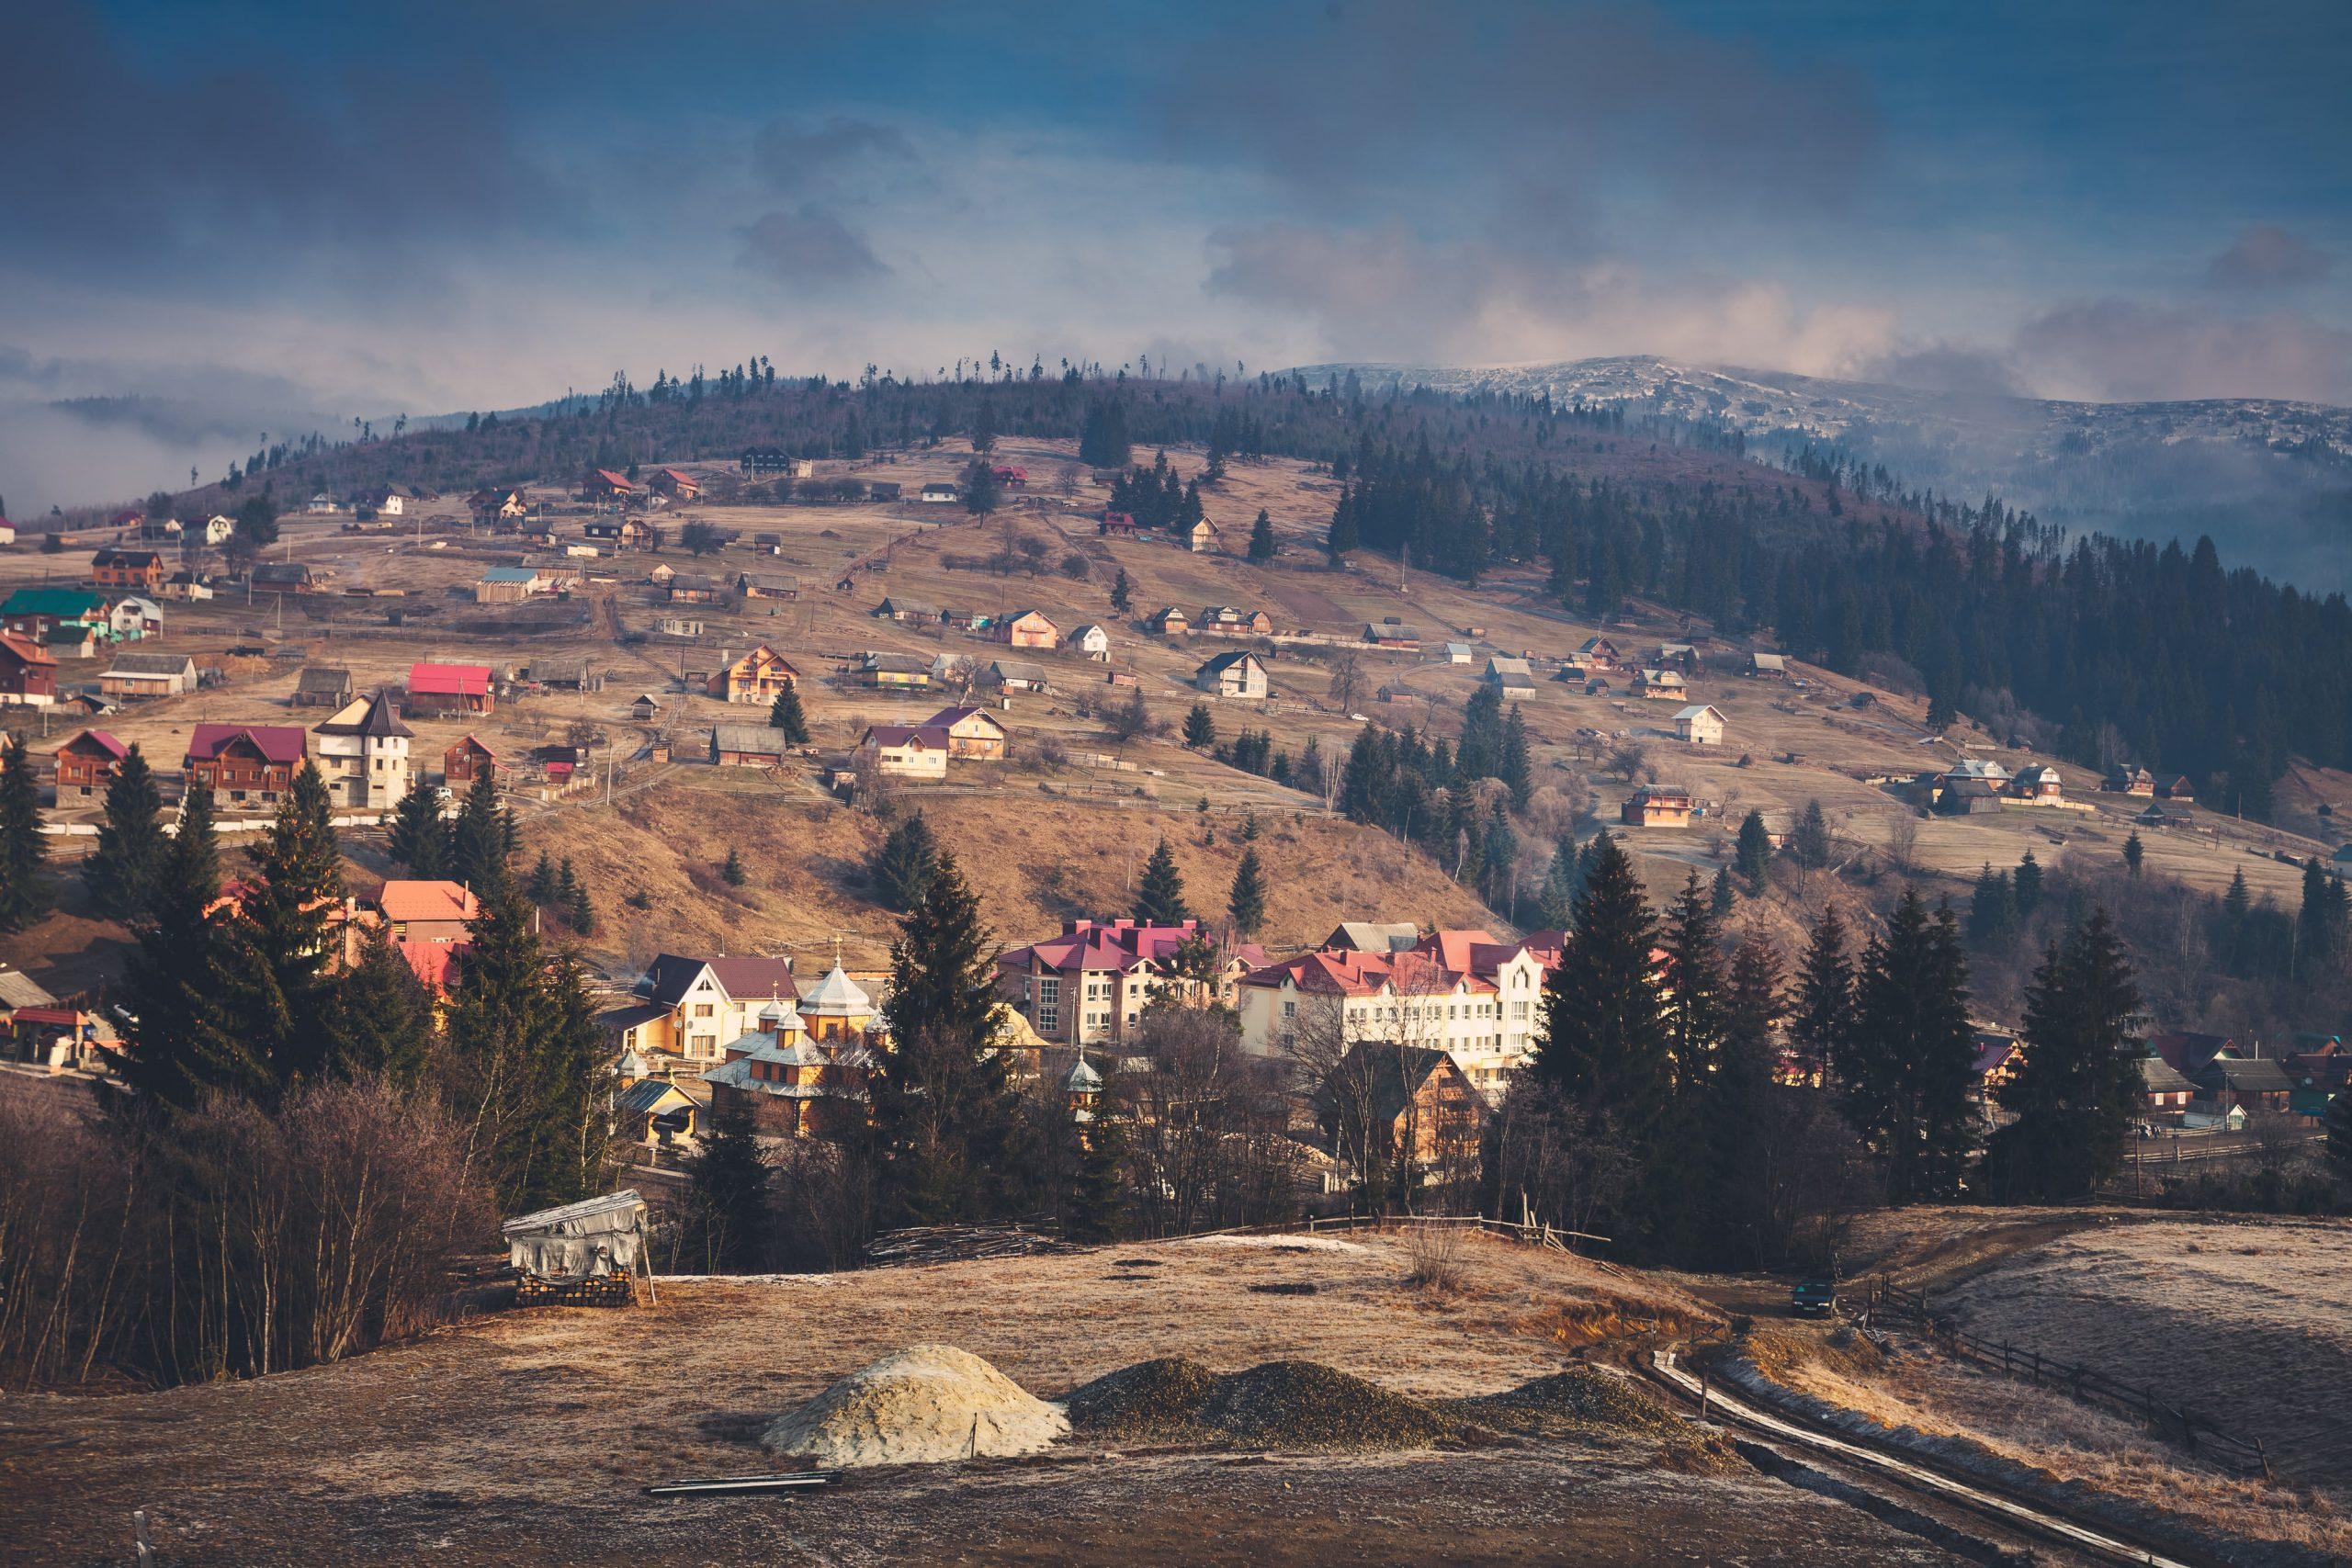 carpathian-village-and-mountains-PNBGKPZ-min